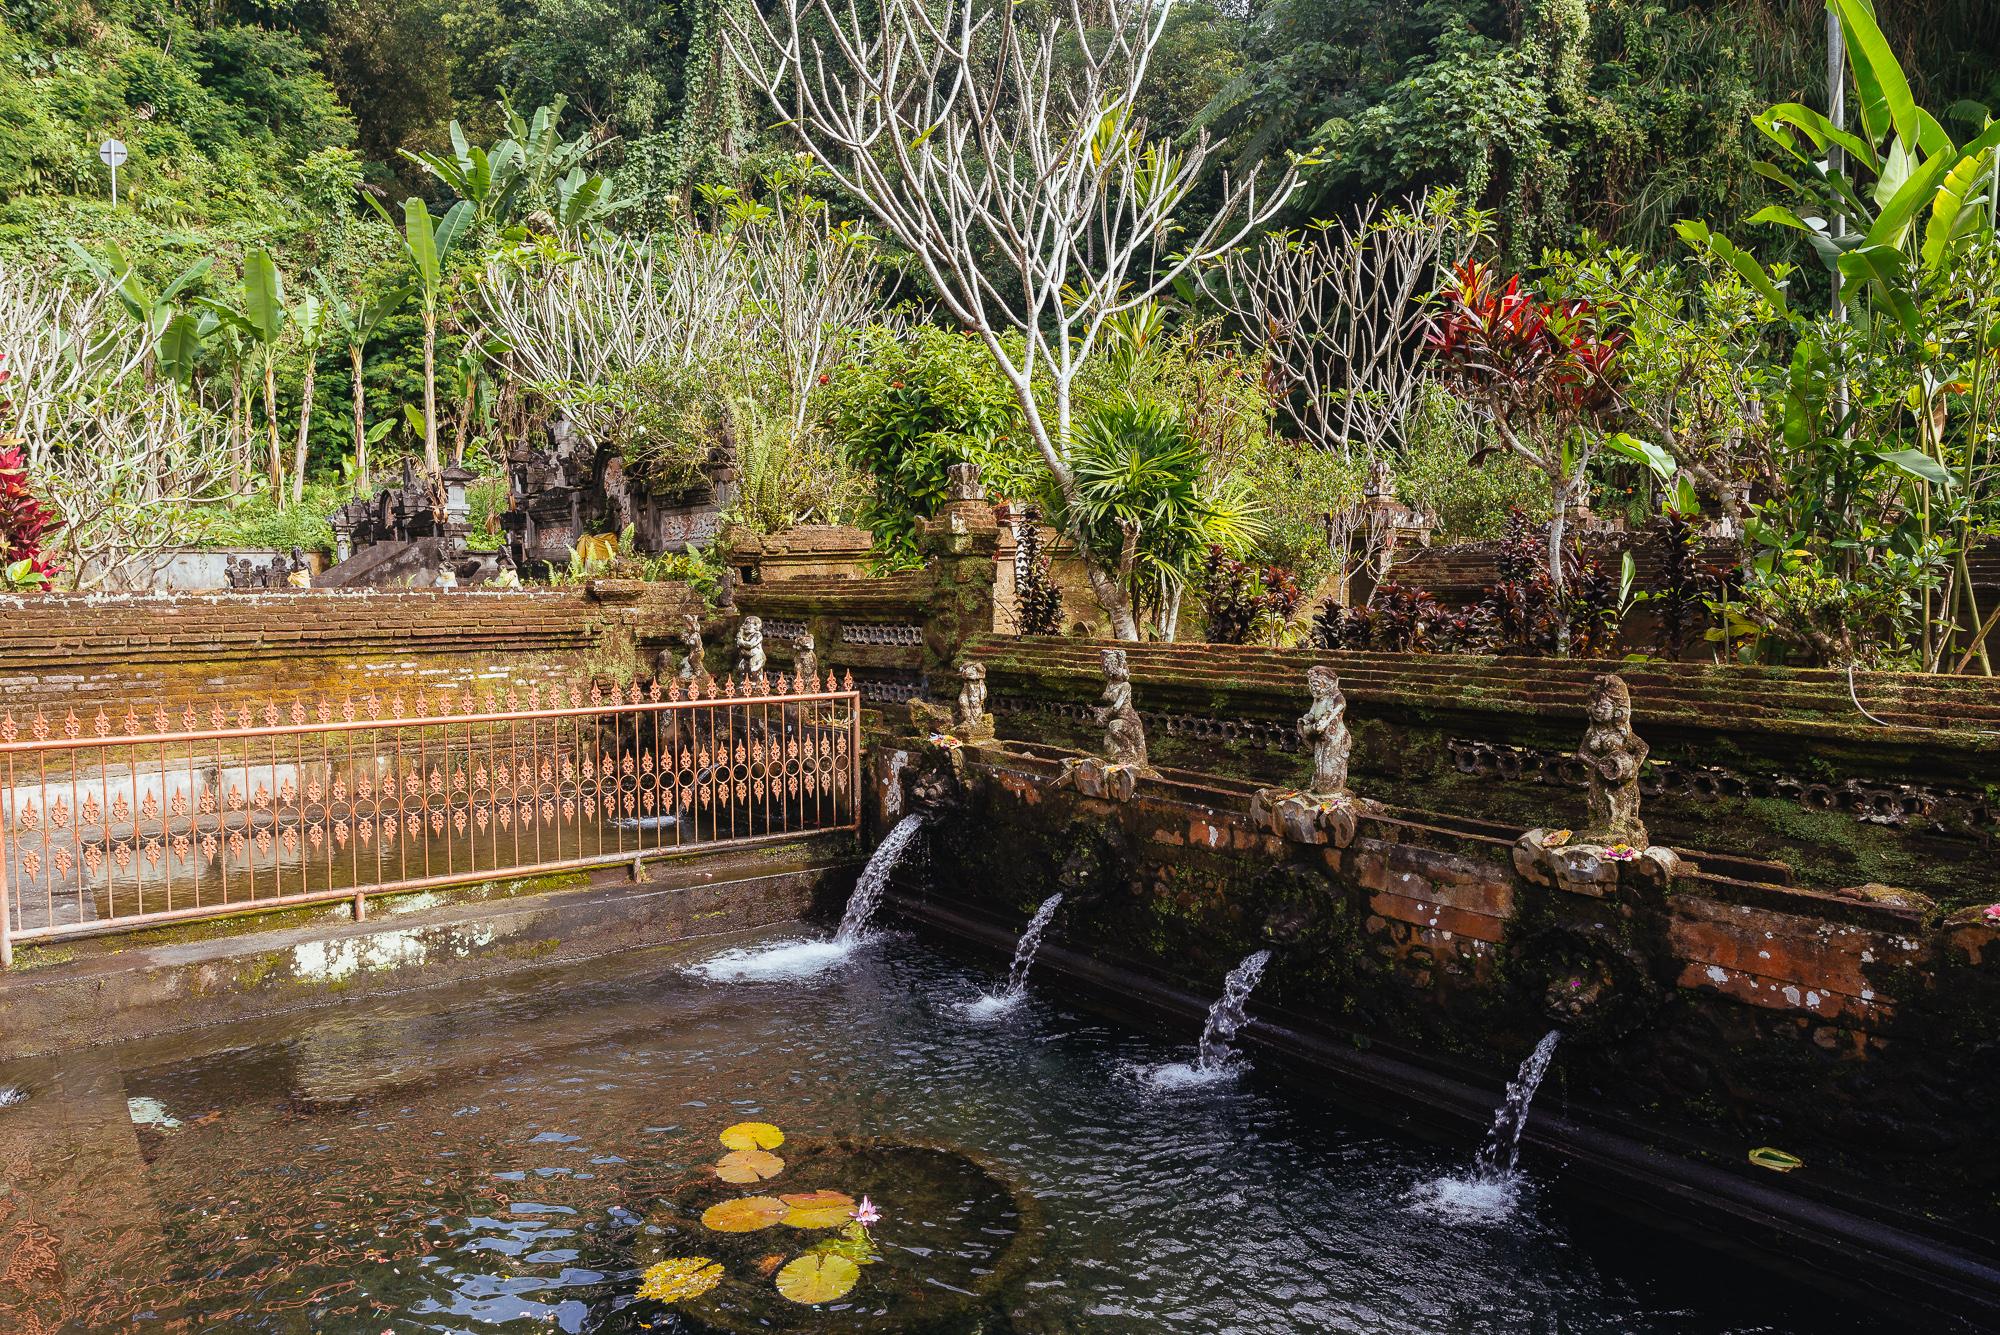 indonesia_2017-340.jpg